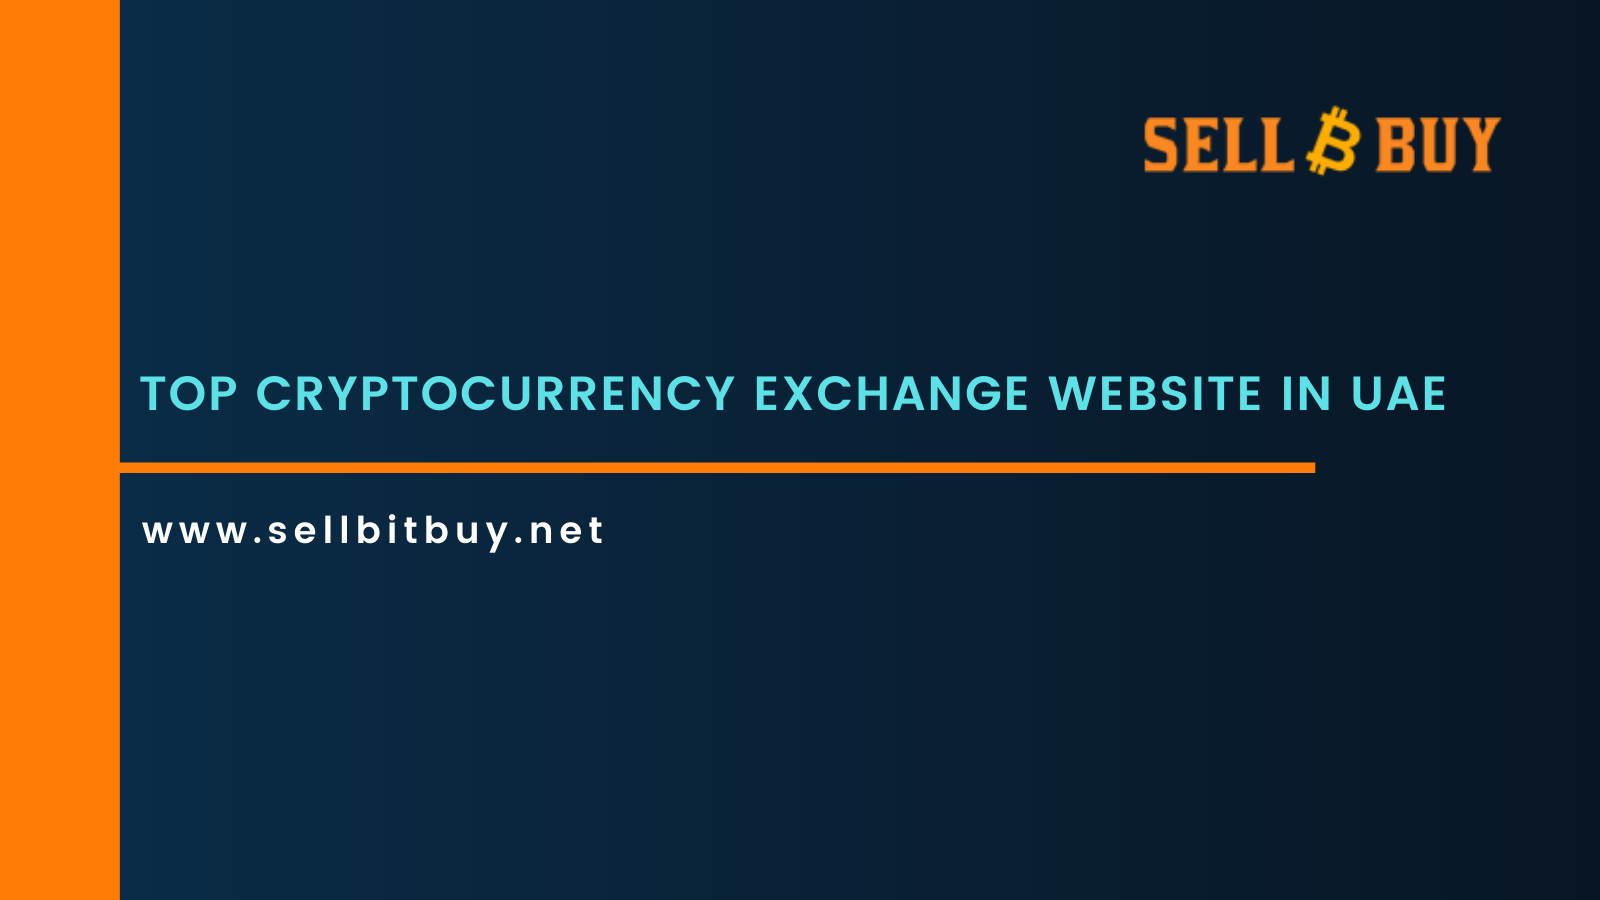 Top Cryptocurrency Exchanges Website in UAE